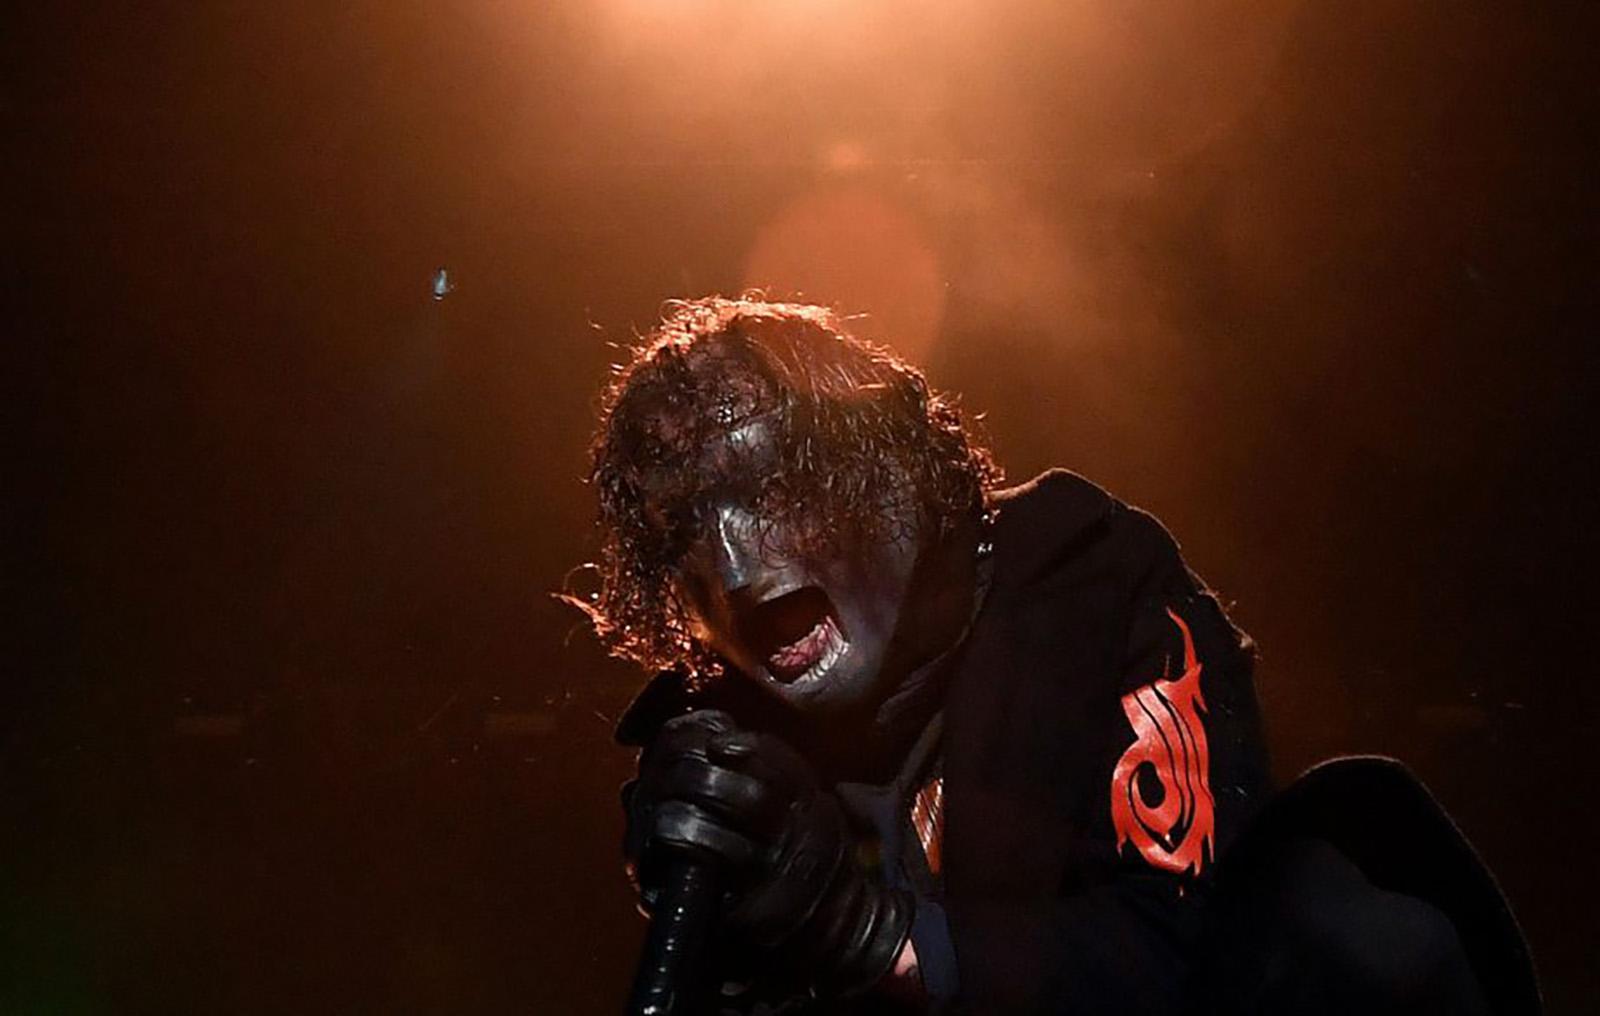 Slipknot's Corey Taylor Explains New Album Title 'We Are Not Your Kind'